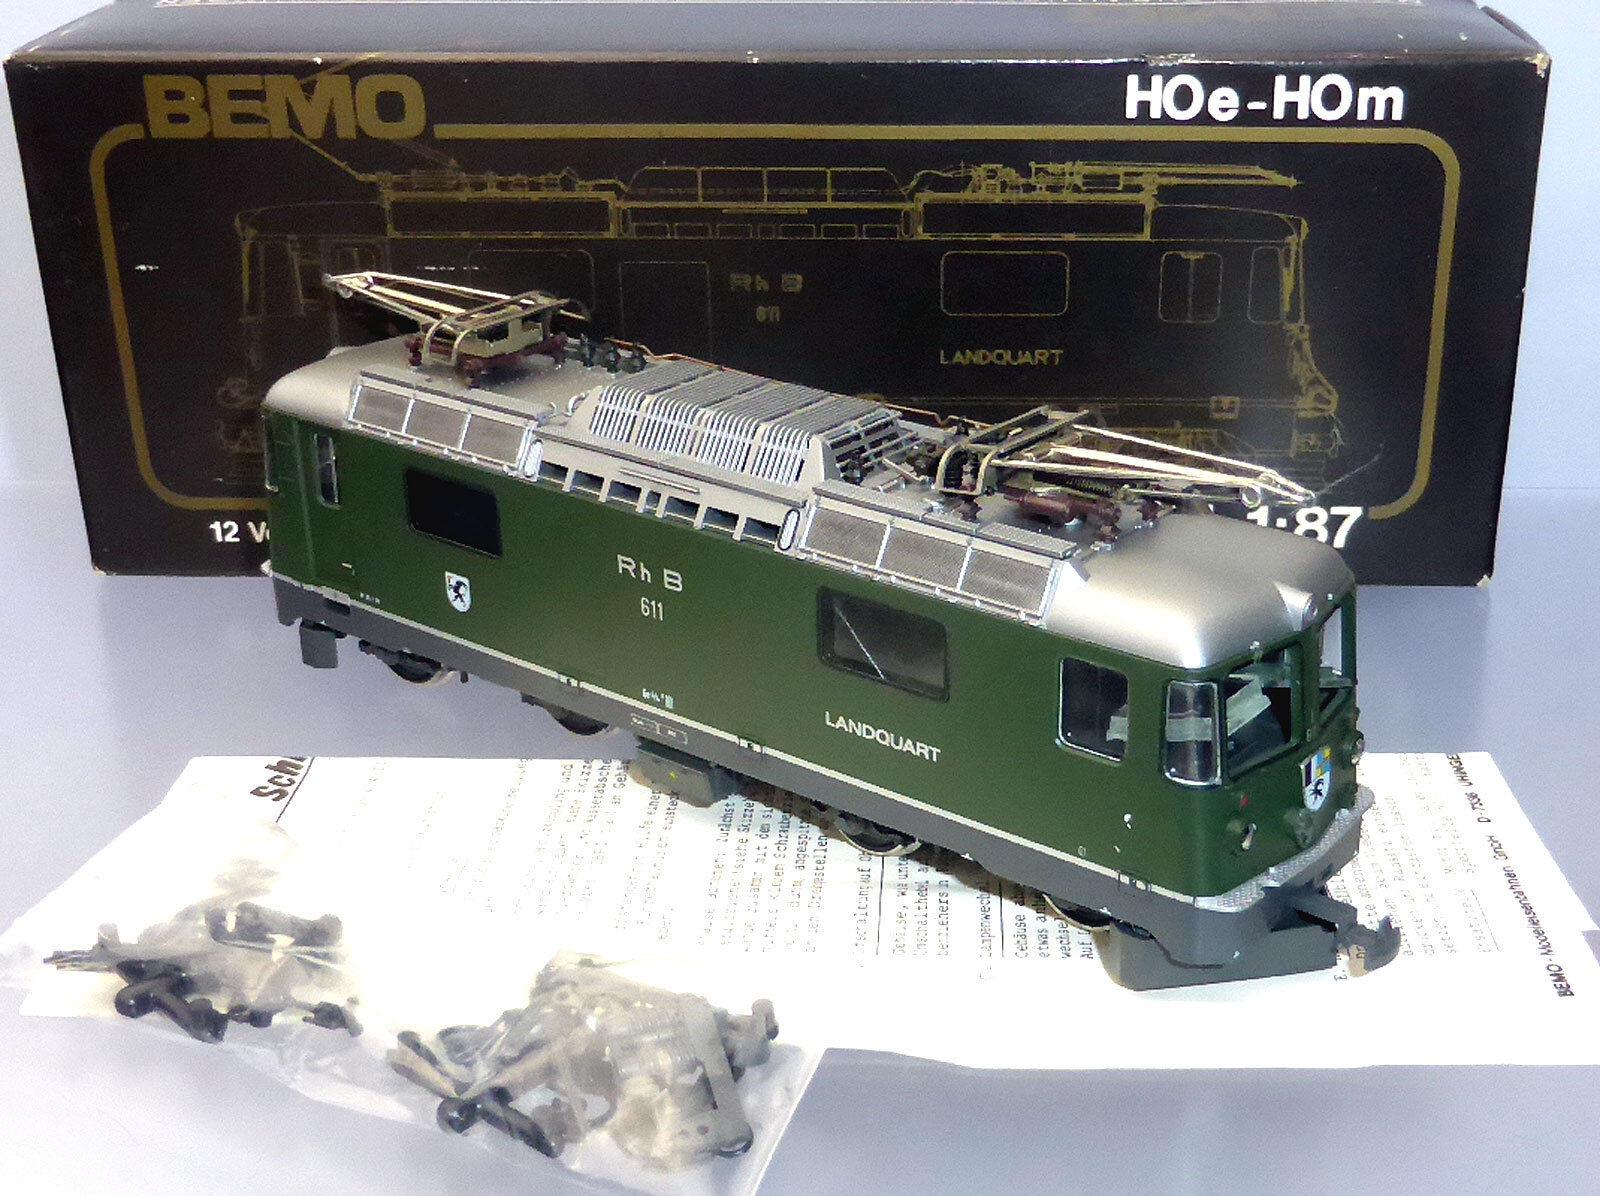 BEMO 1258 111; universallok RHB Ge 4 4 II 611 paese Quart, verde, in scatola originale h421